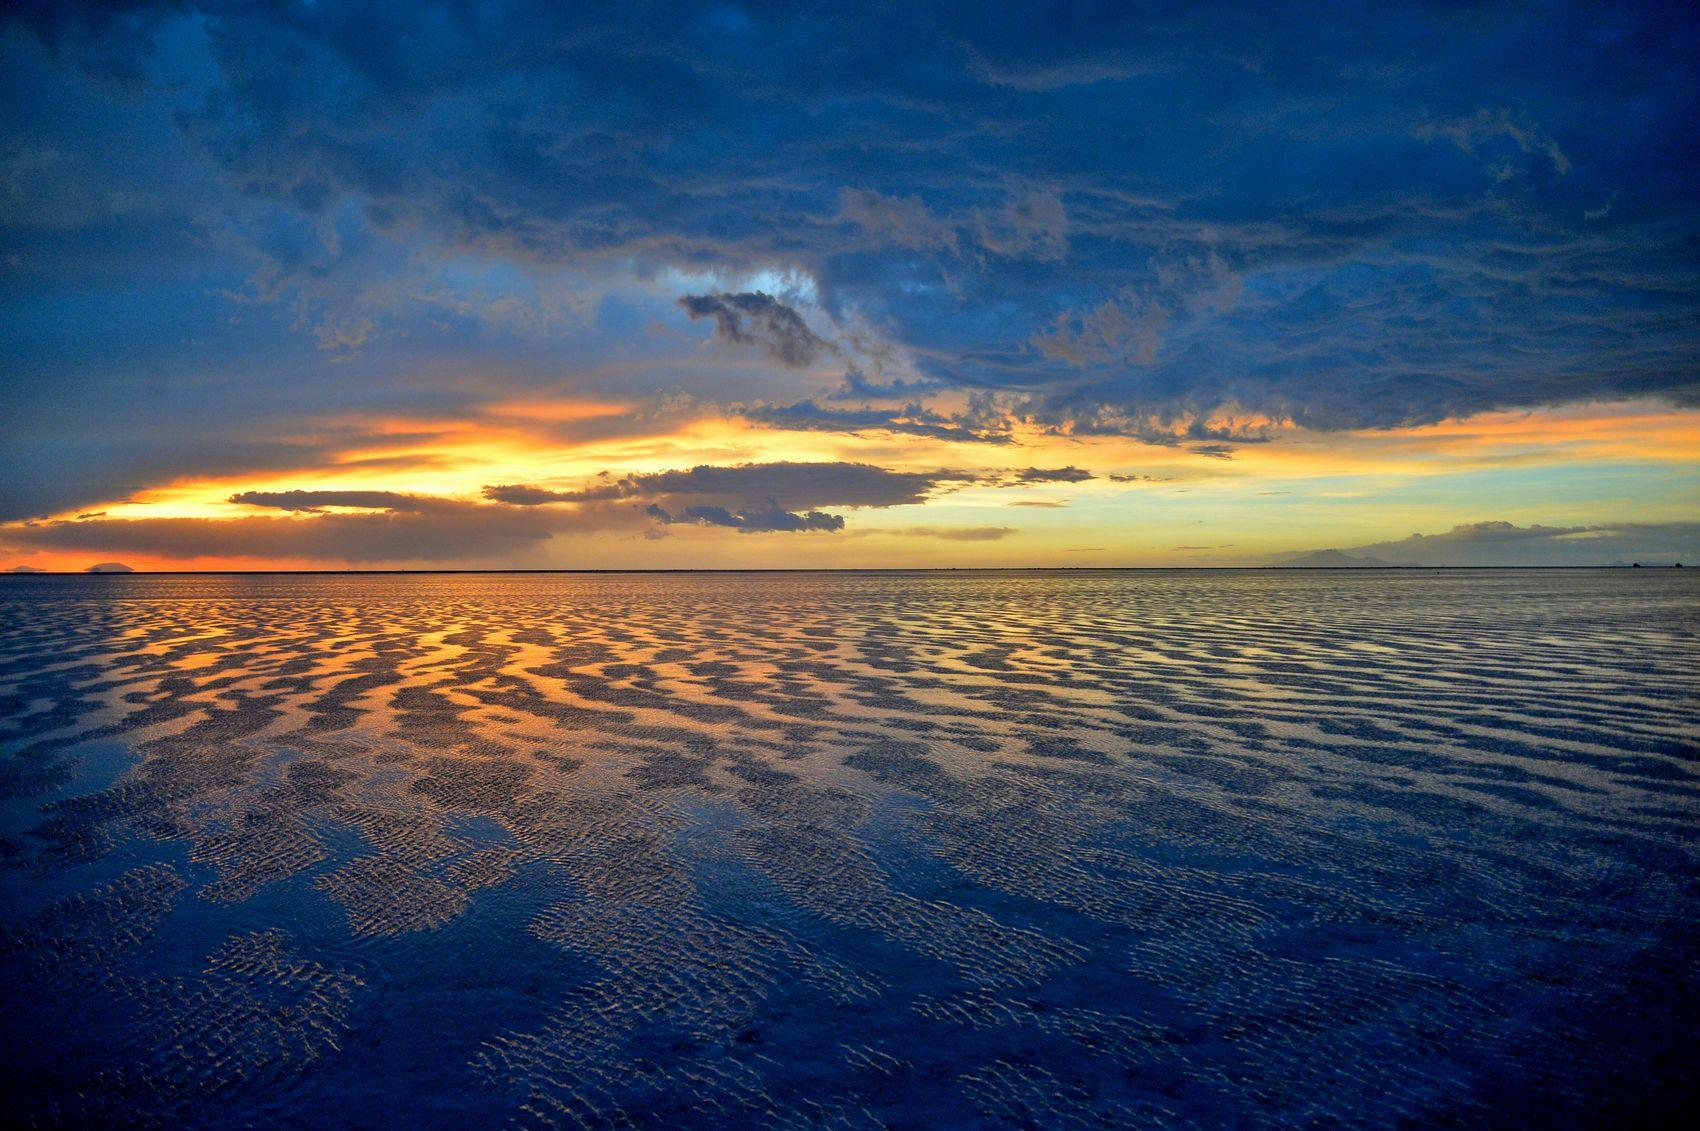 Gust Stom Bolivia Salardeuyuni Amazing View Sunset Strong Wind Waves Sky And Clouds Nikon Df BlueAlbum